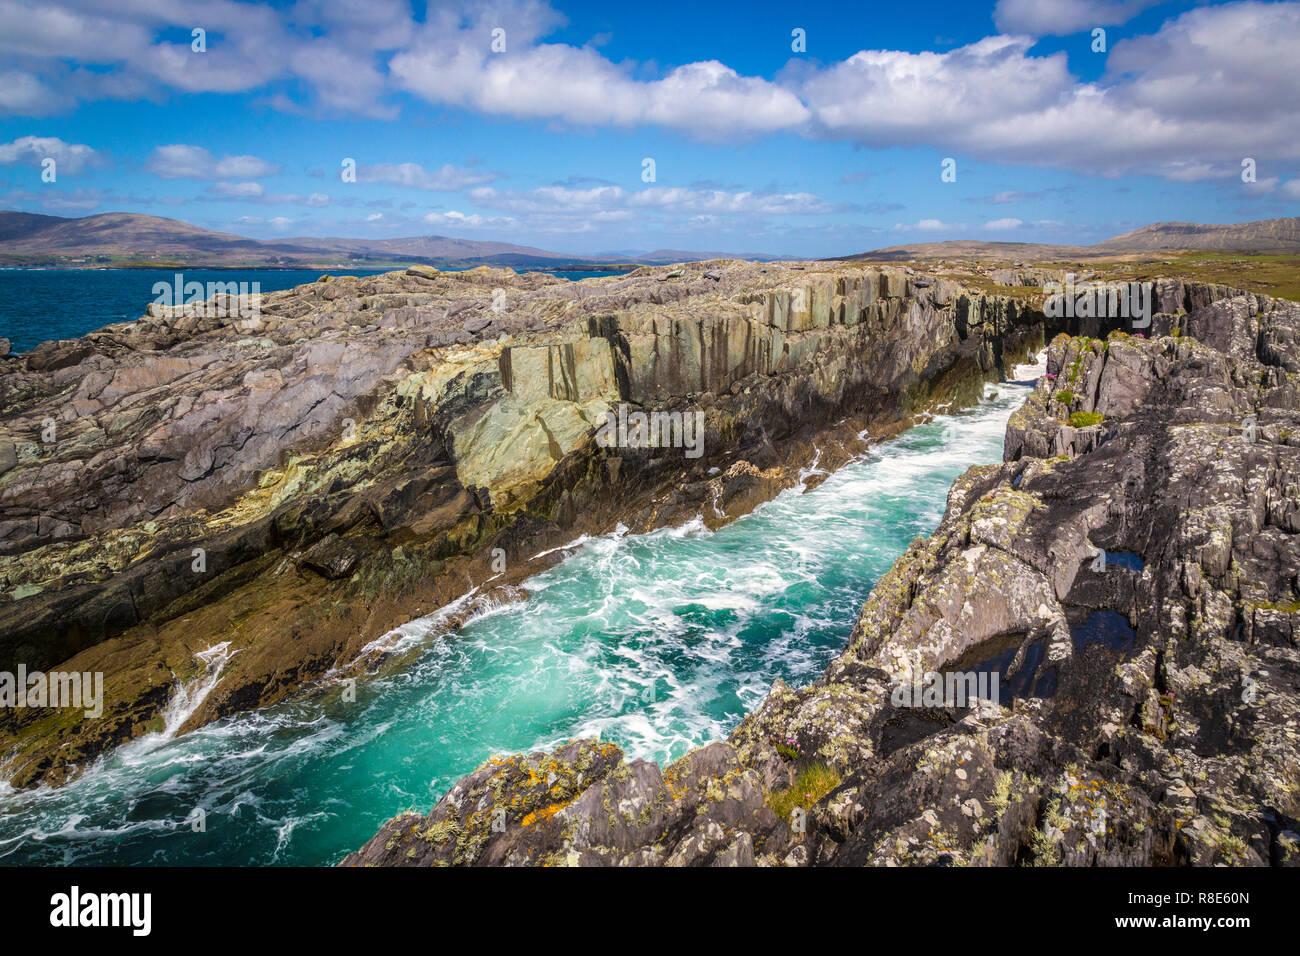 natural stone bridge at Dunmanus Bay, West Cork, Ireland - Stock Image